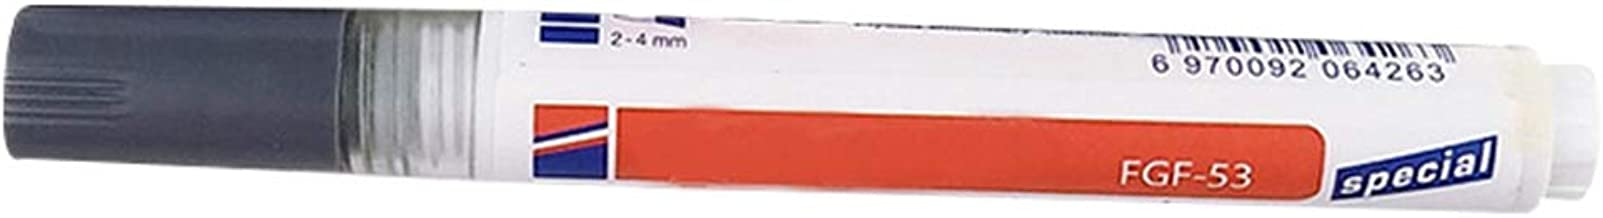 Liamostee Tile Grout Coating Marker Wall Floor Ceramic Tiles Gaps Professional Repair Pen